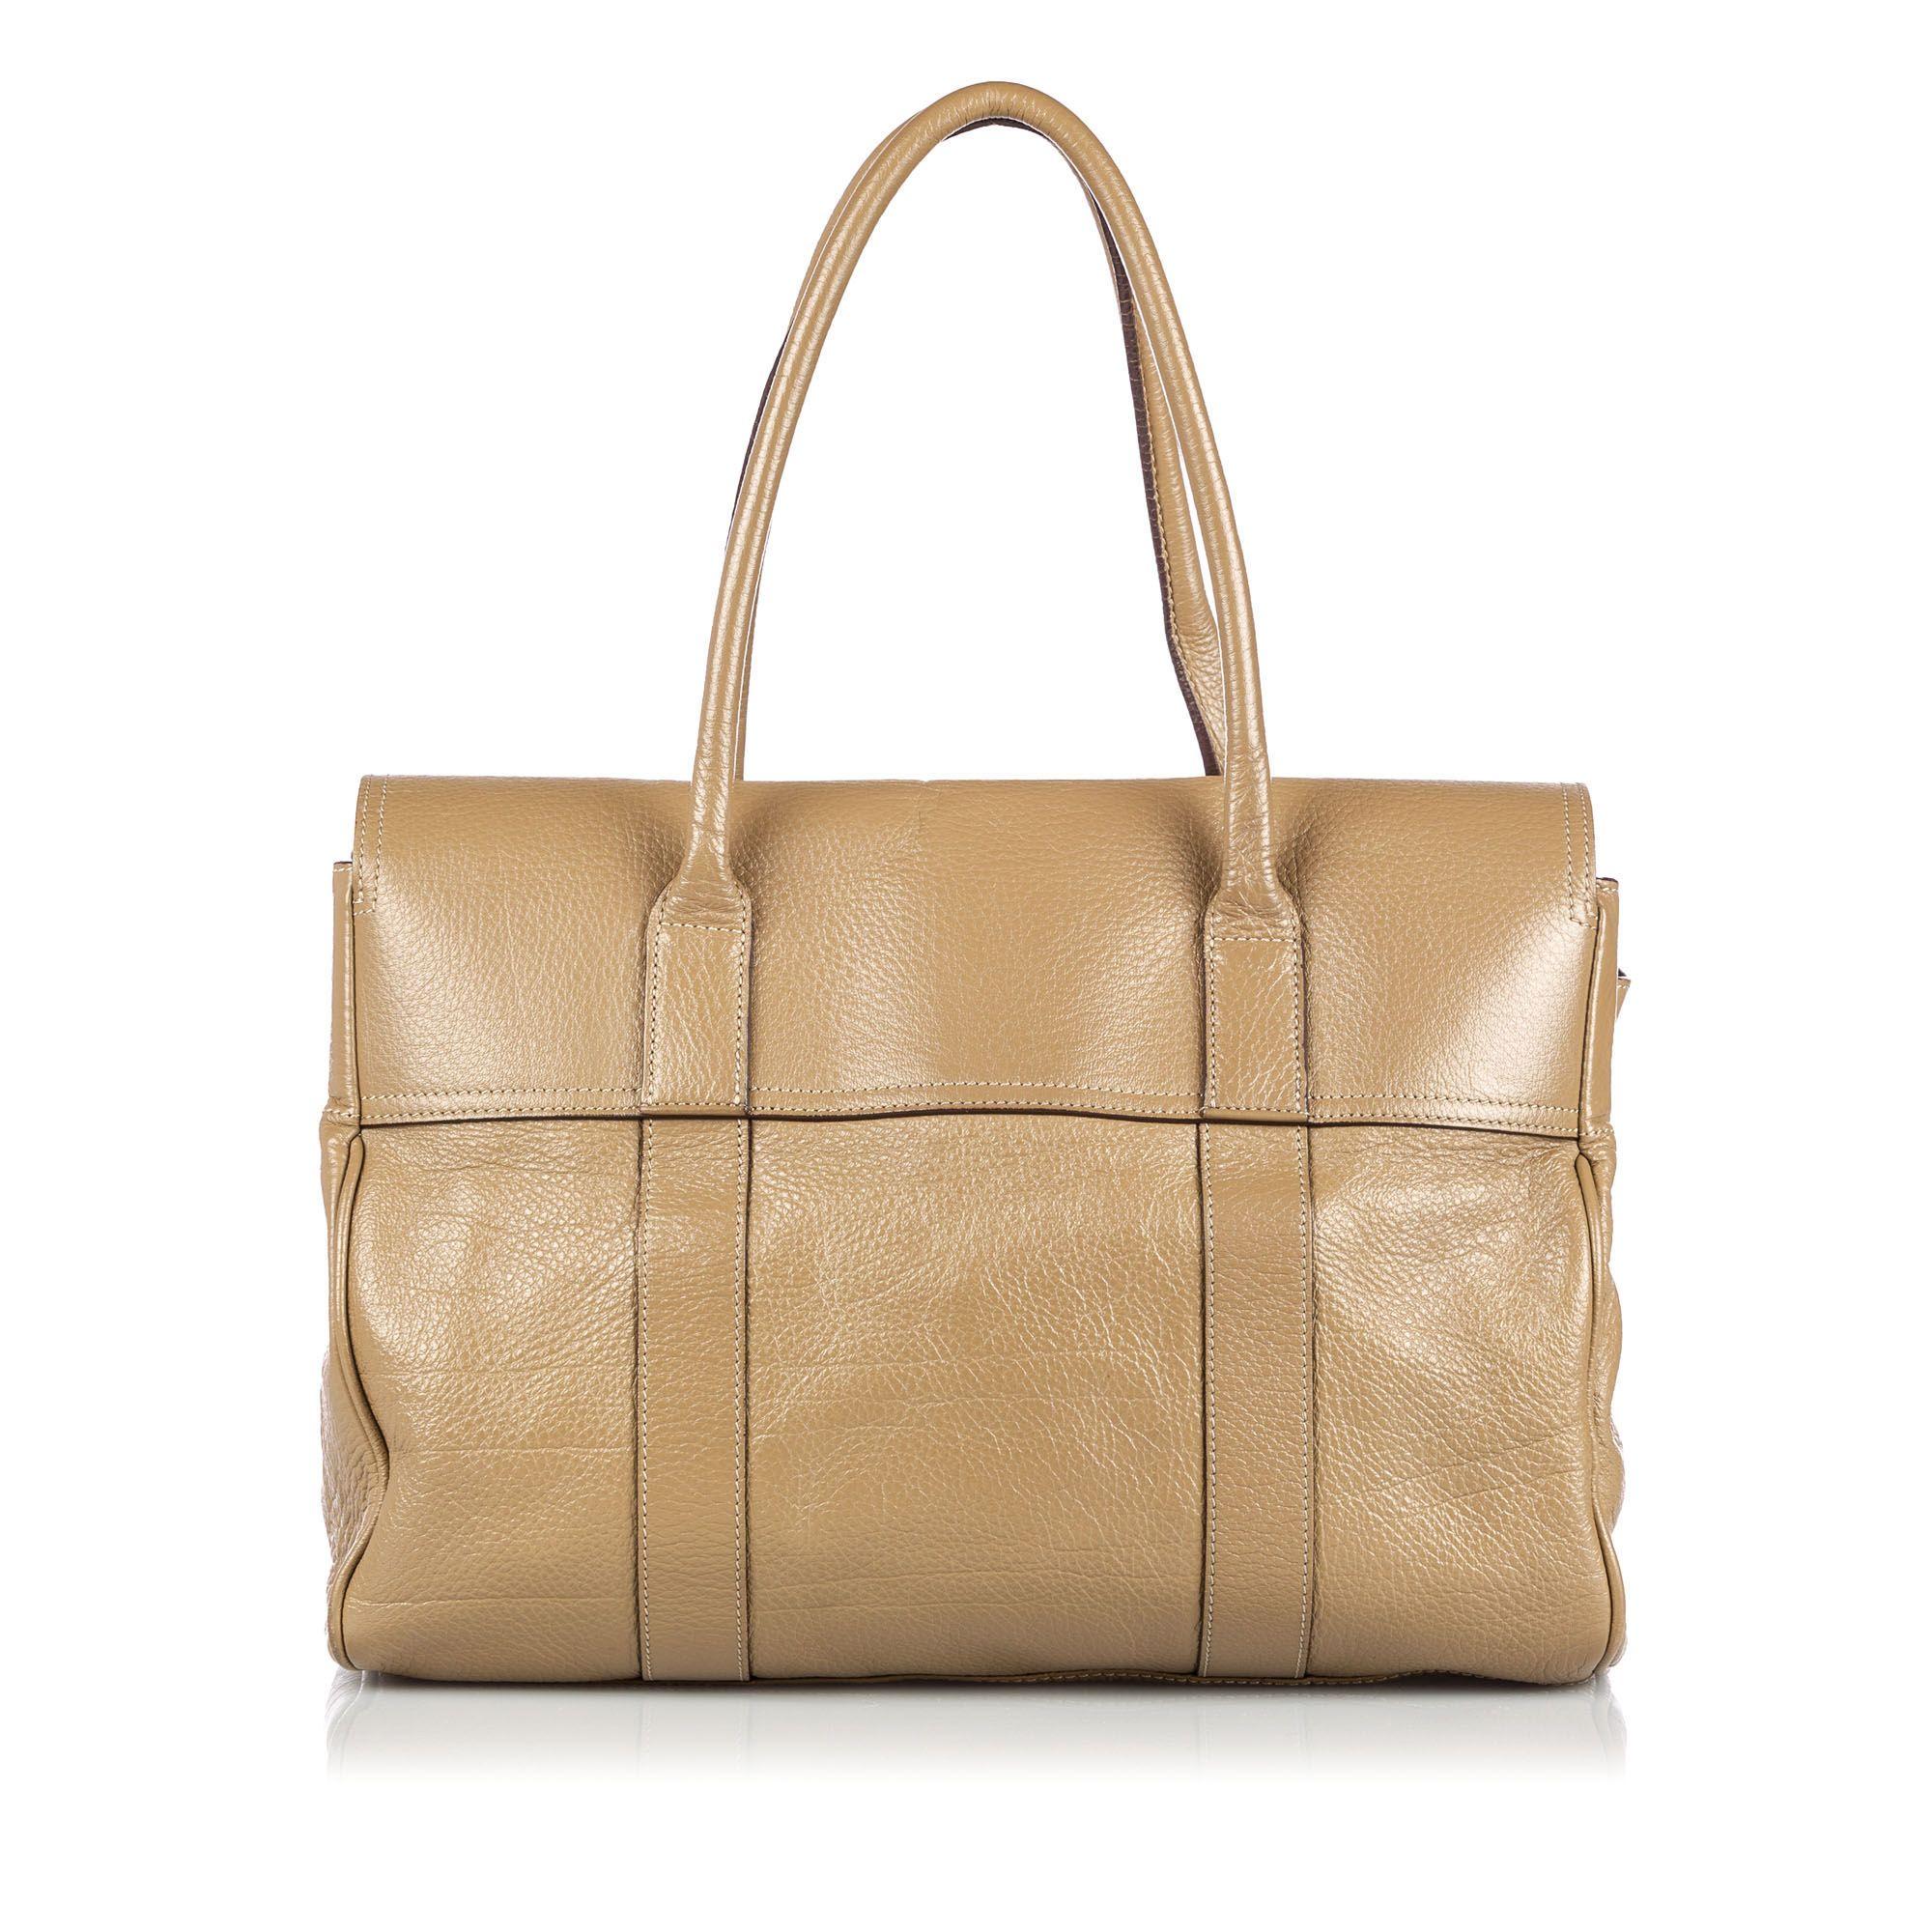 Vintage Mulberry Leather Bayswater Handbag Brown